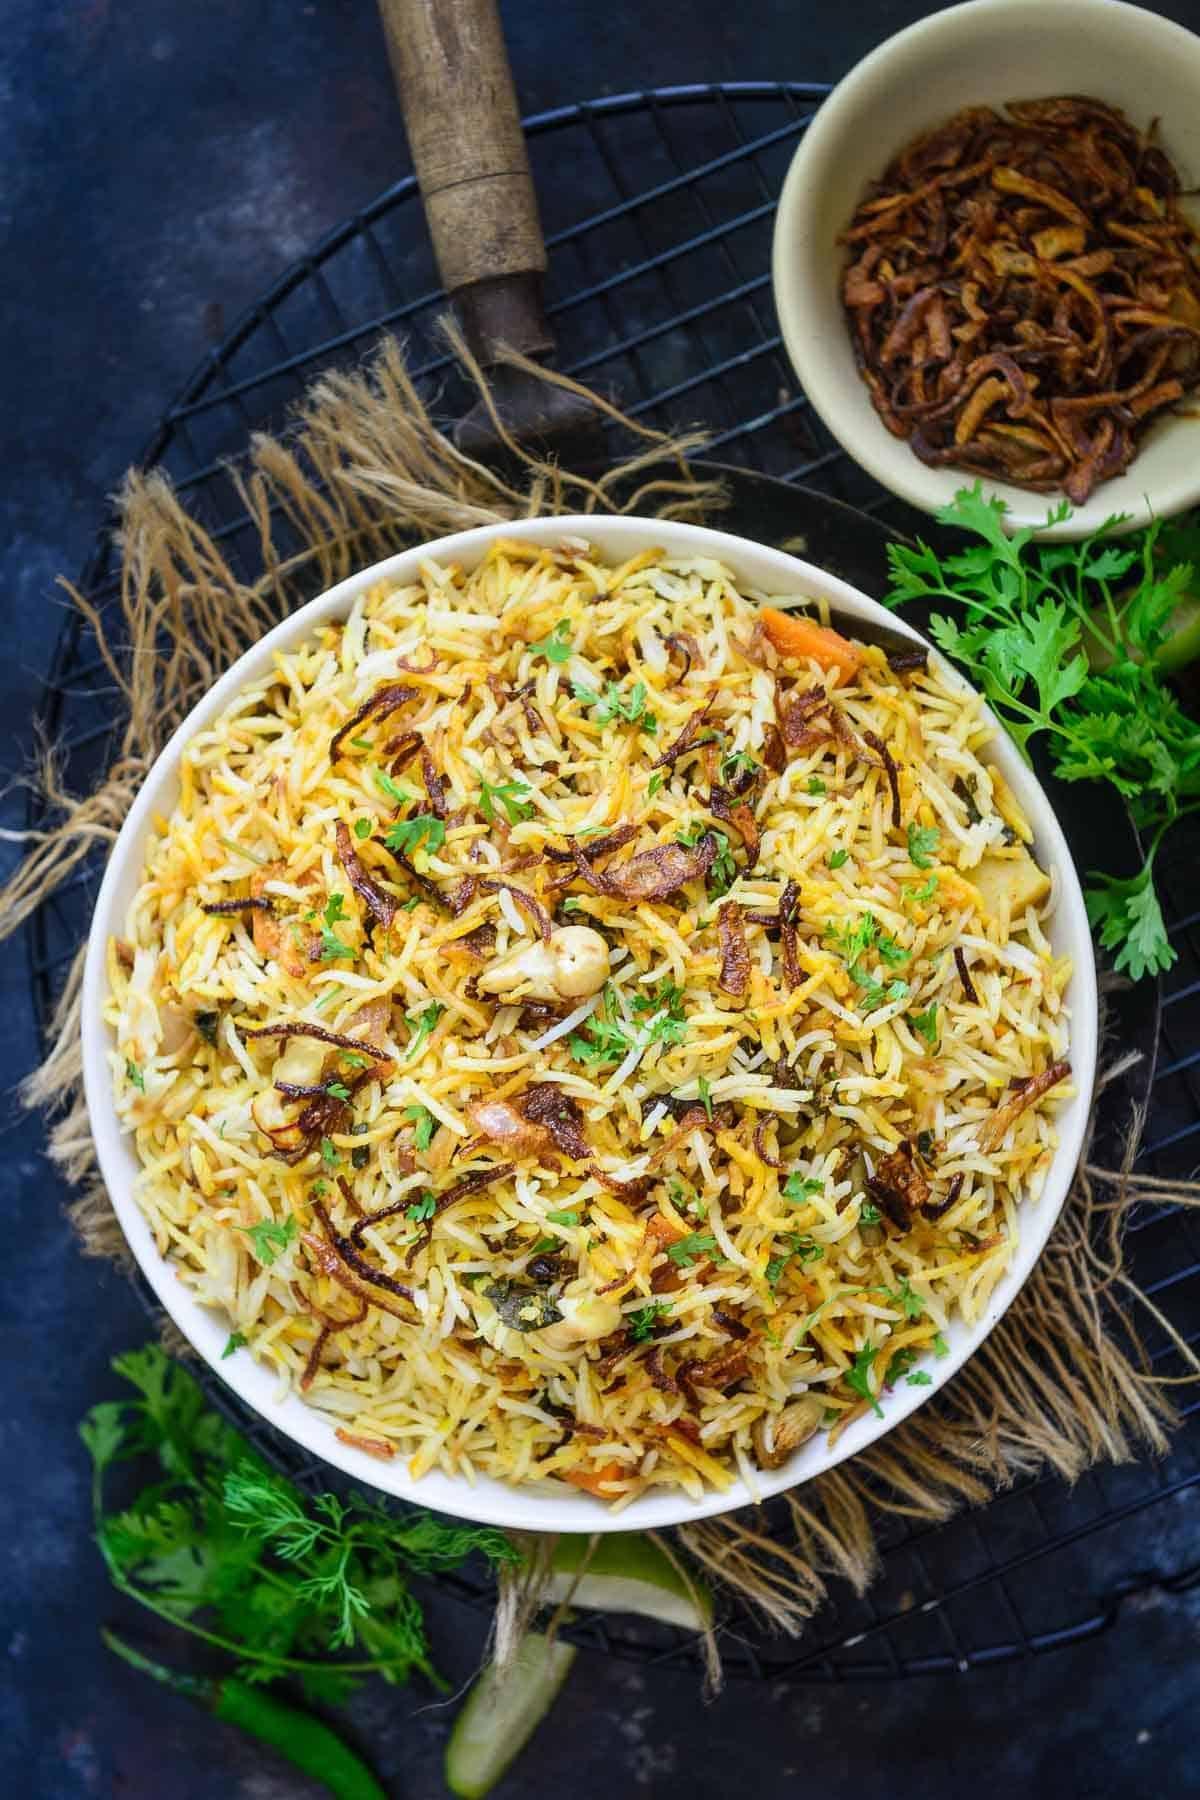 Hyderabadi Veg Biryani served in a bowl.